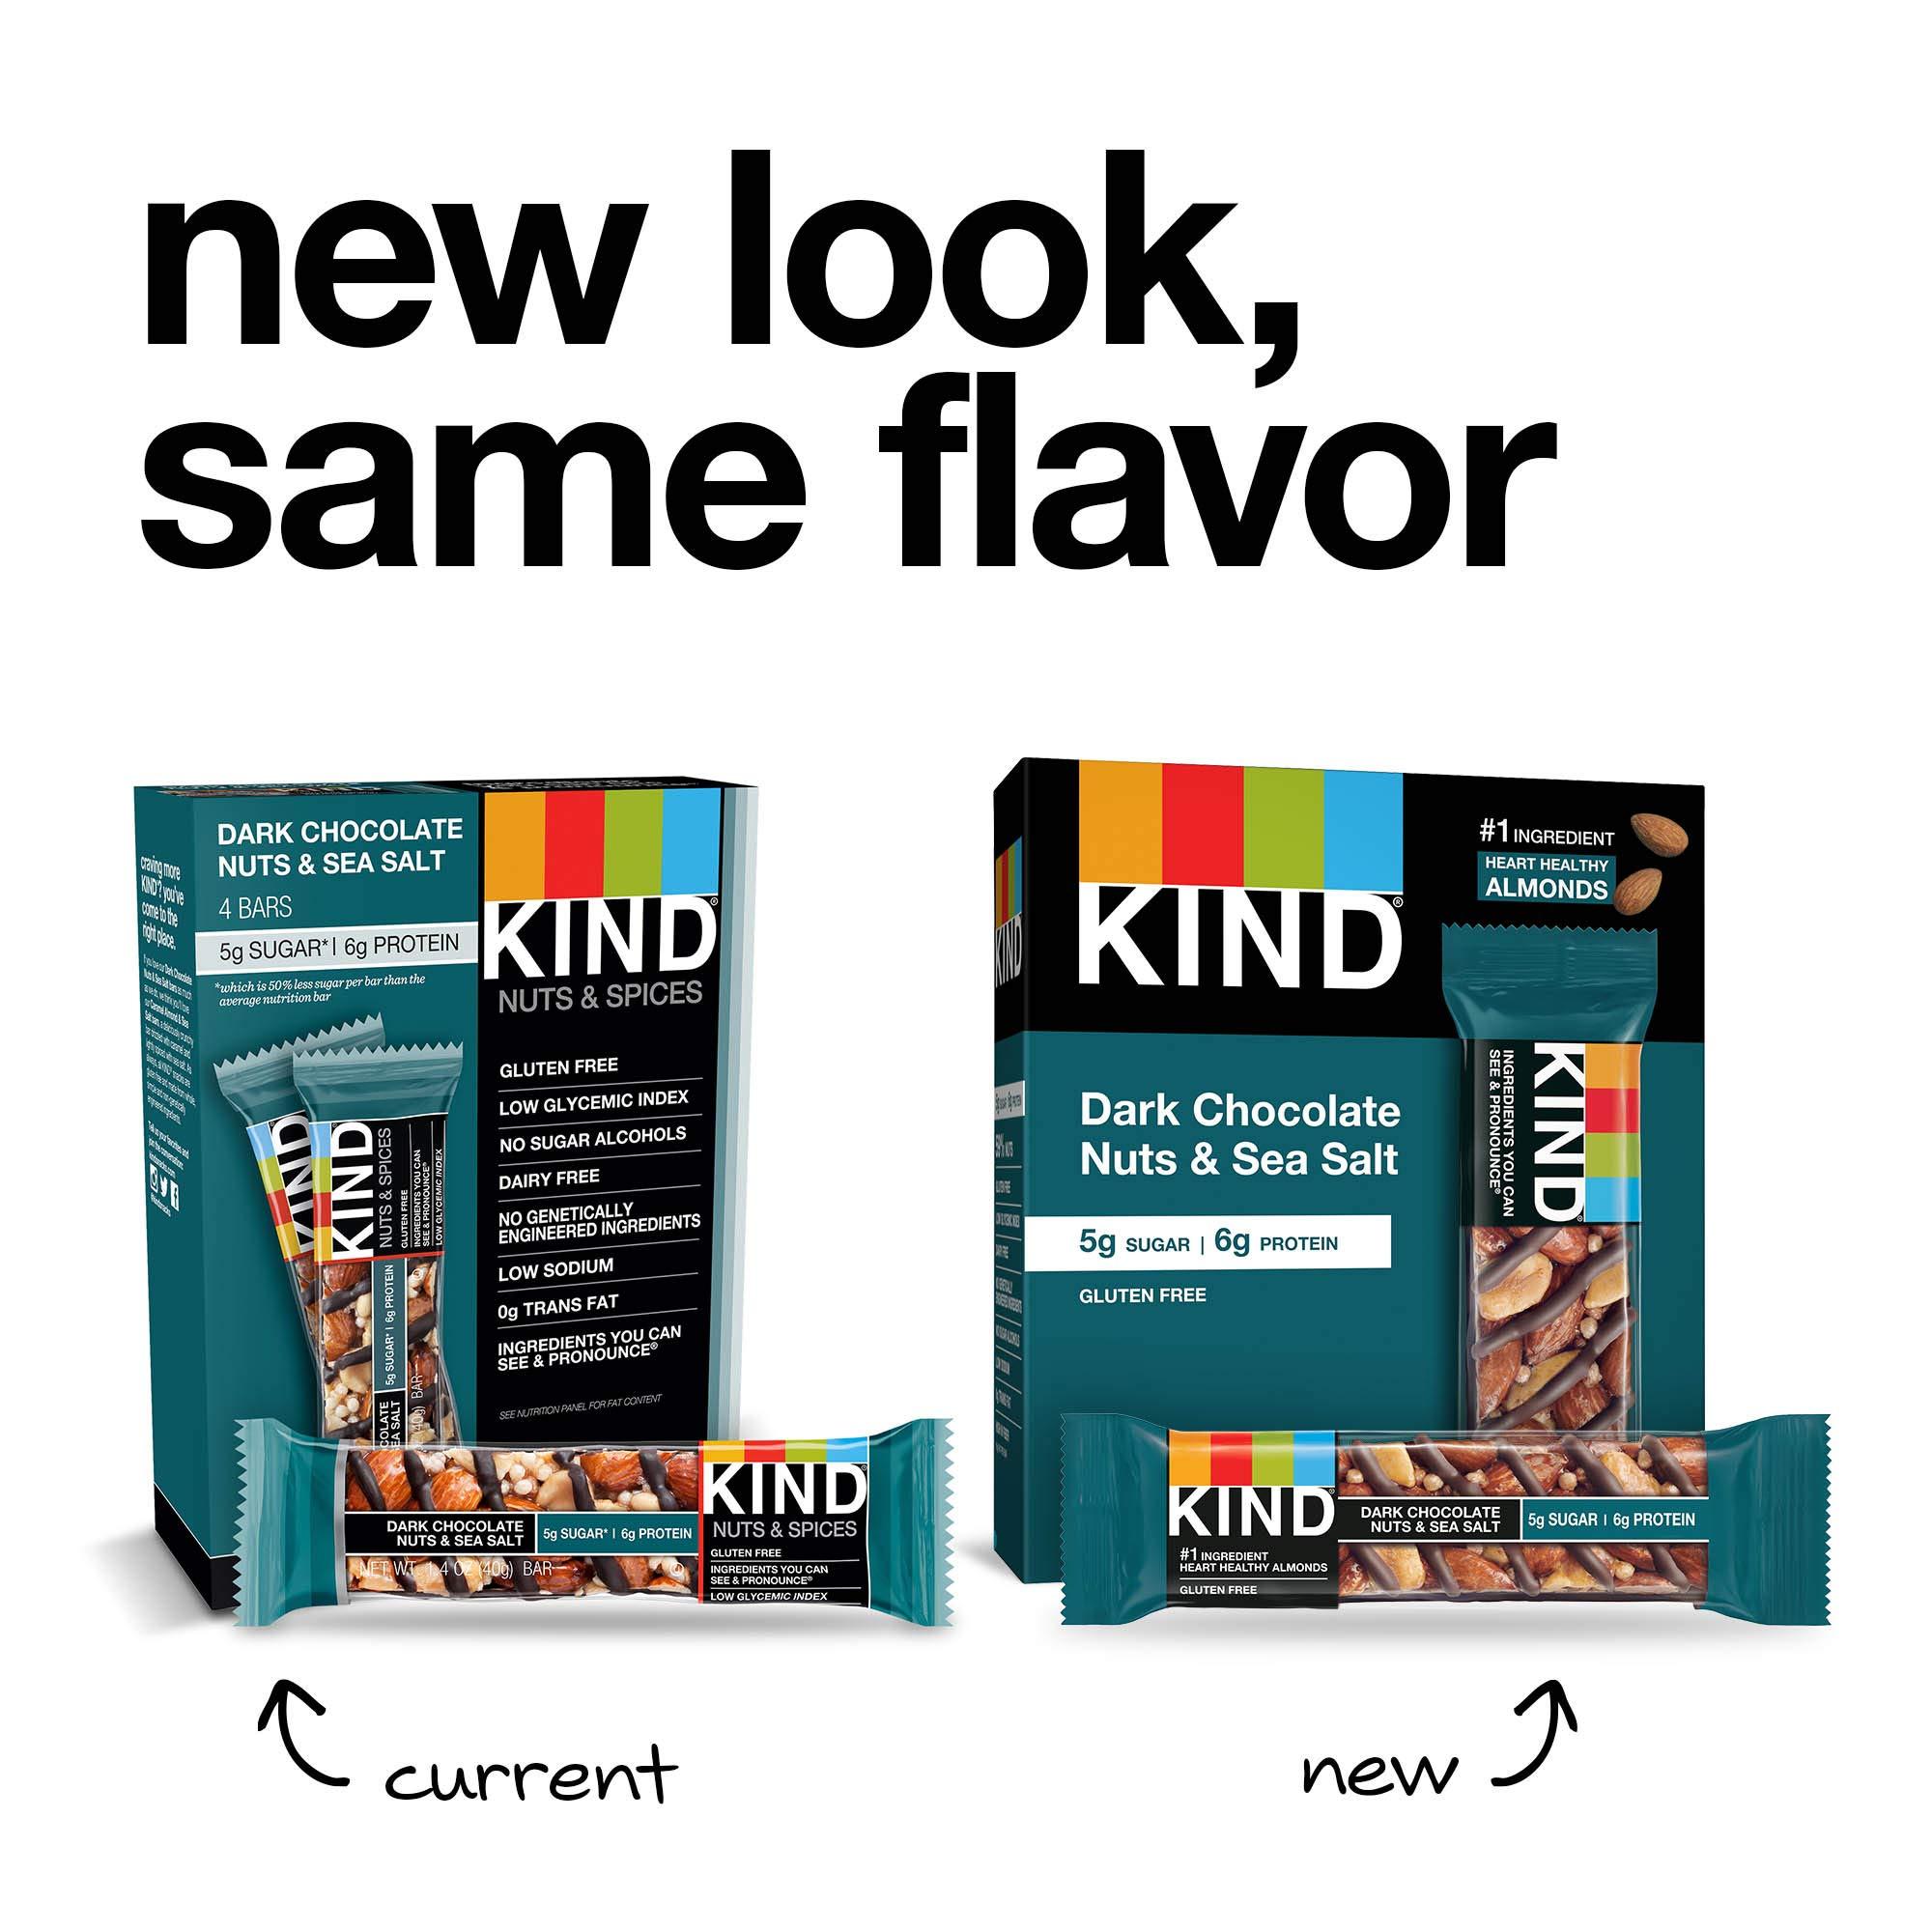 KIND Bars, Dark Chocolate Nuts & Sea Salt, Gluten Free, Low Sugar, 1.4oz, 48 Count by KIND (Image #5)